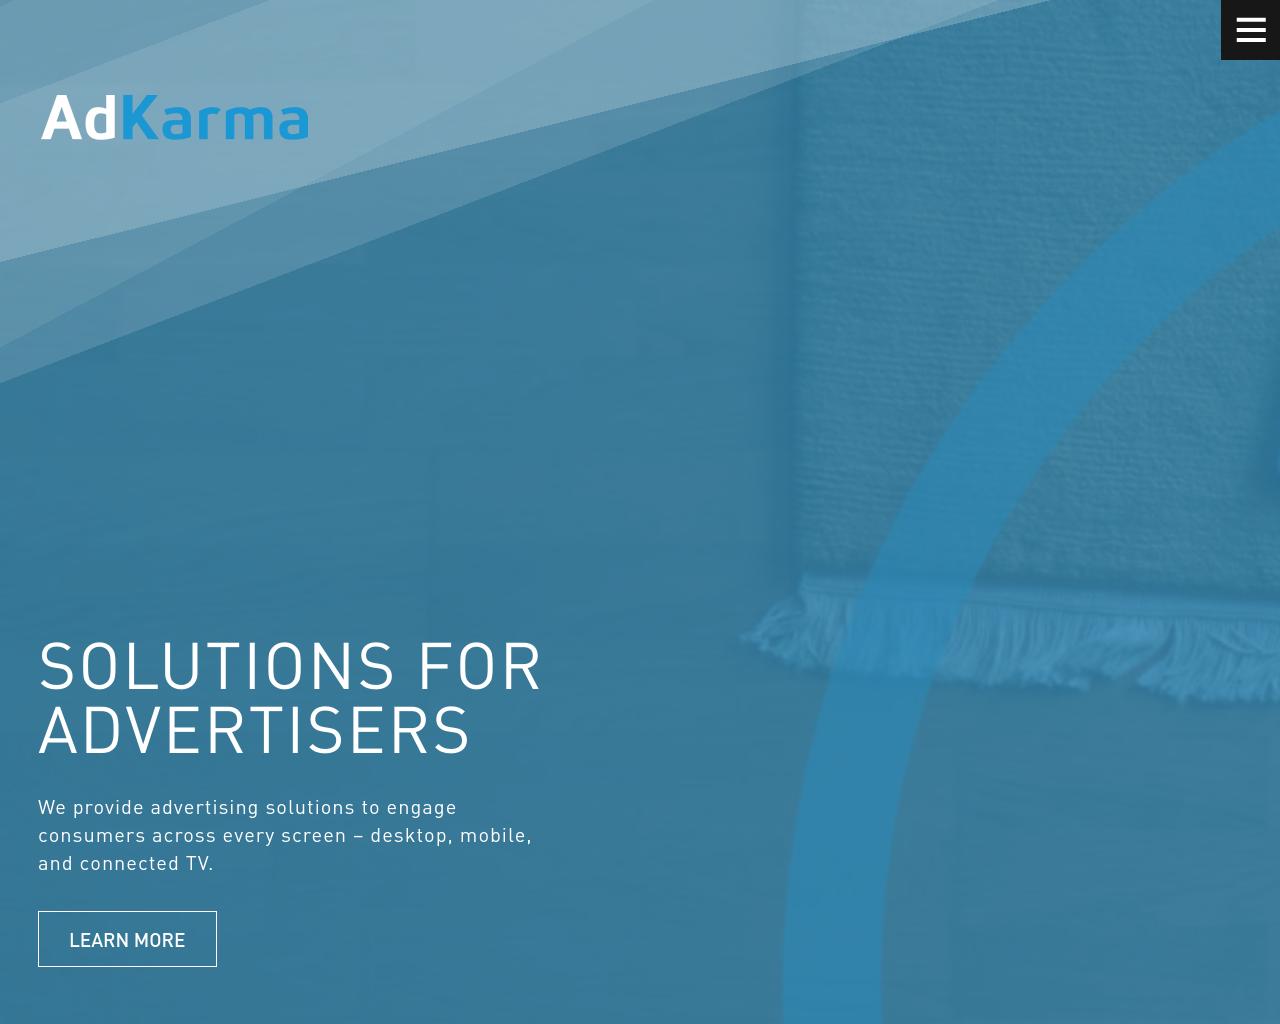 Adkarma-Advertising-Reviews-Pricing